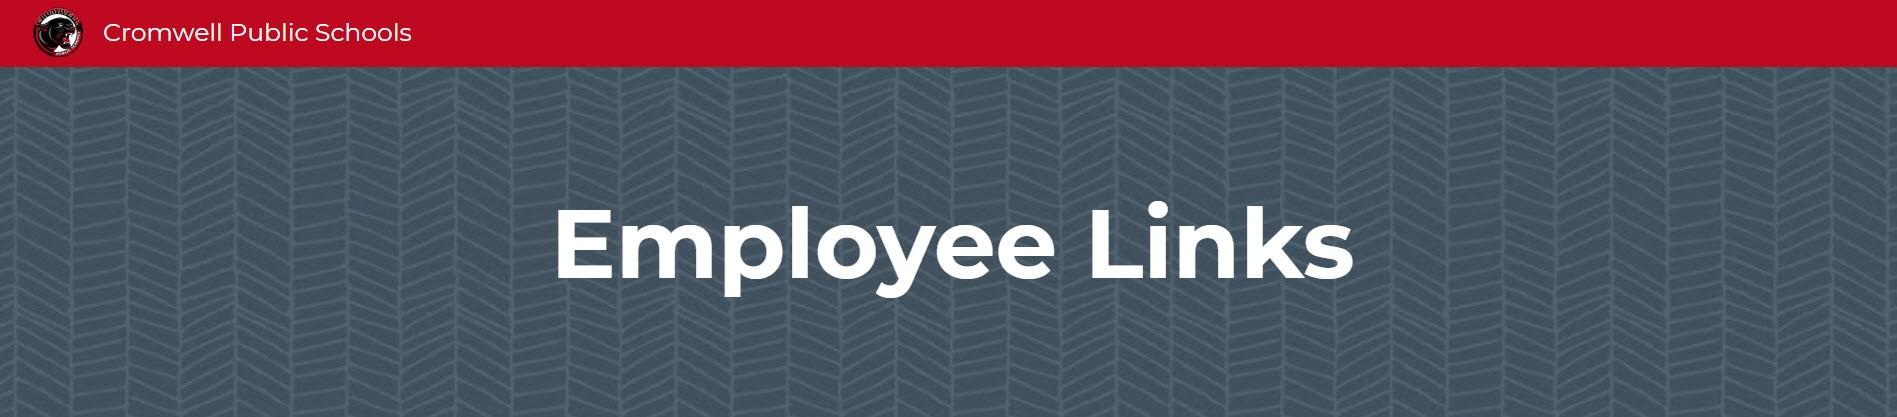 employee links header photo